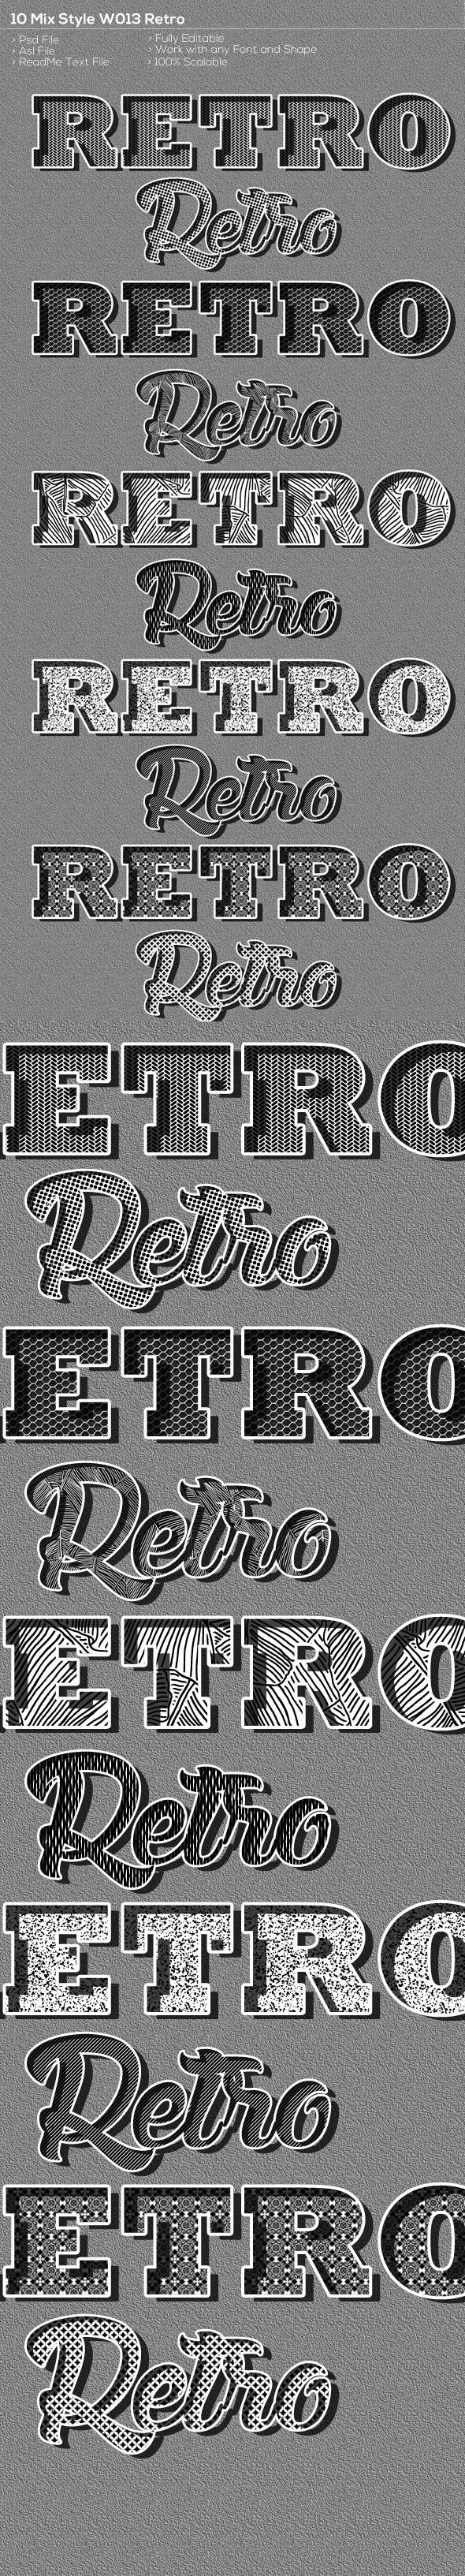 10 Retro Style W013nov - Text Effects Styles